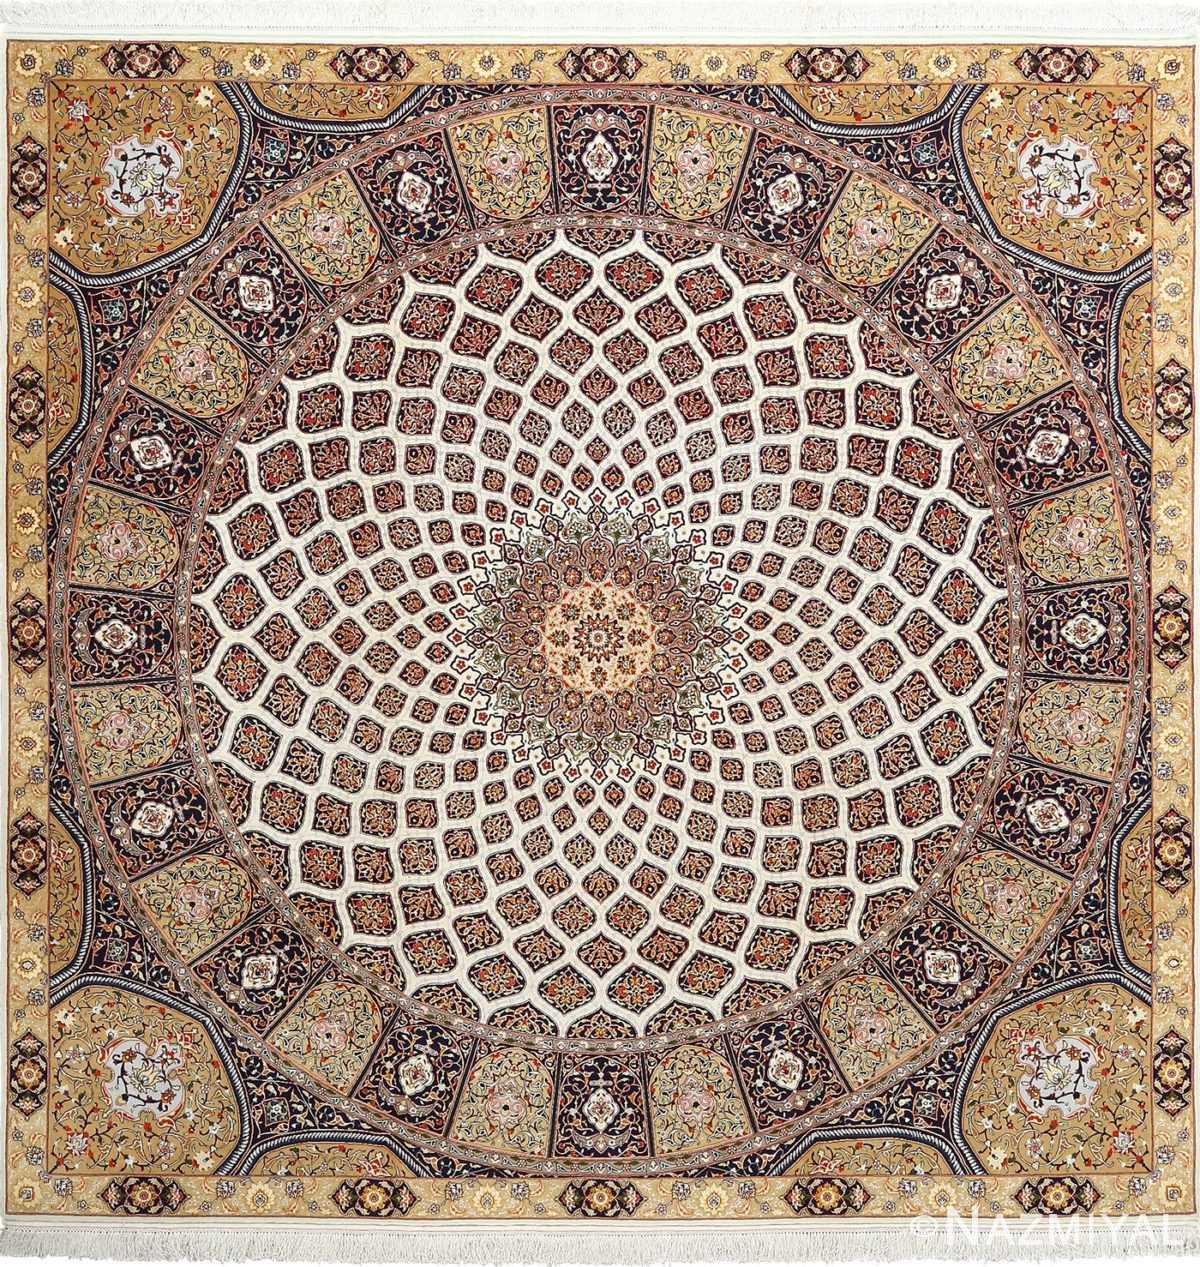 Modern Persian Tabriz Design Rug 44687 Nazmiyal Antique Rugs: Intricate Square Vintage Tabriz Persian Rug 51075 By Nazmiyal